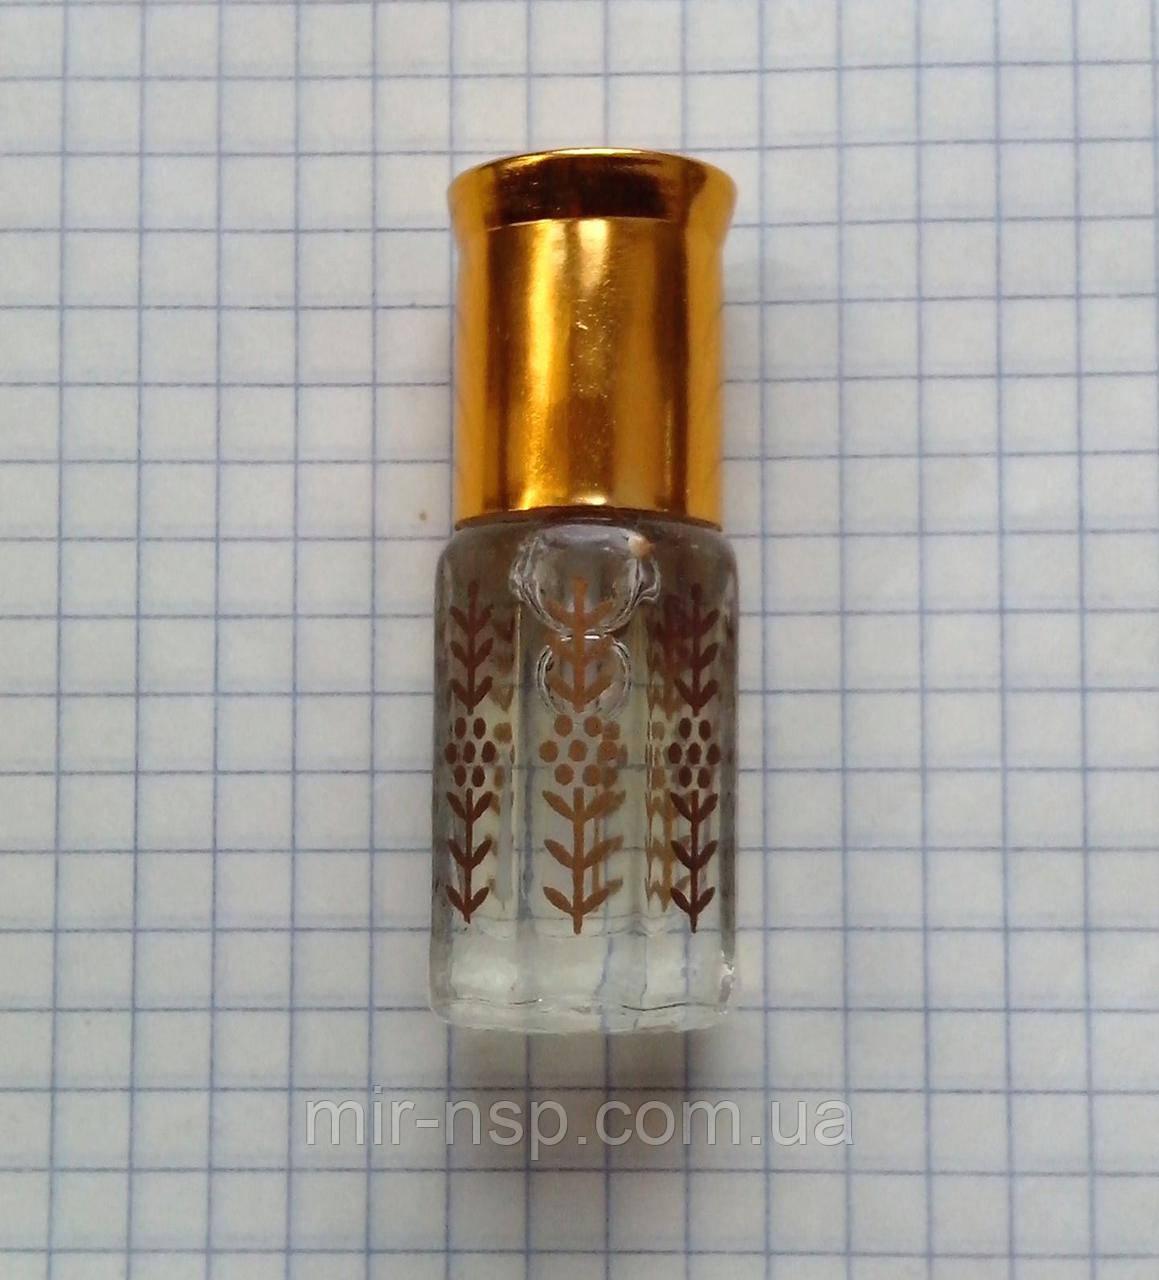 Oud Musk арабские масляные духи 3 мл ОАЭ